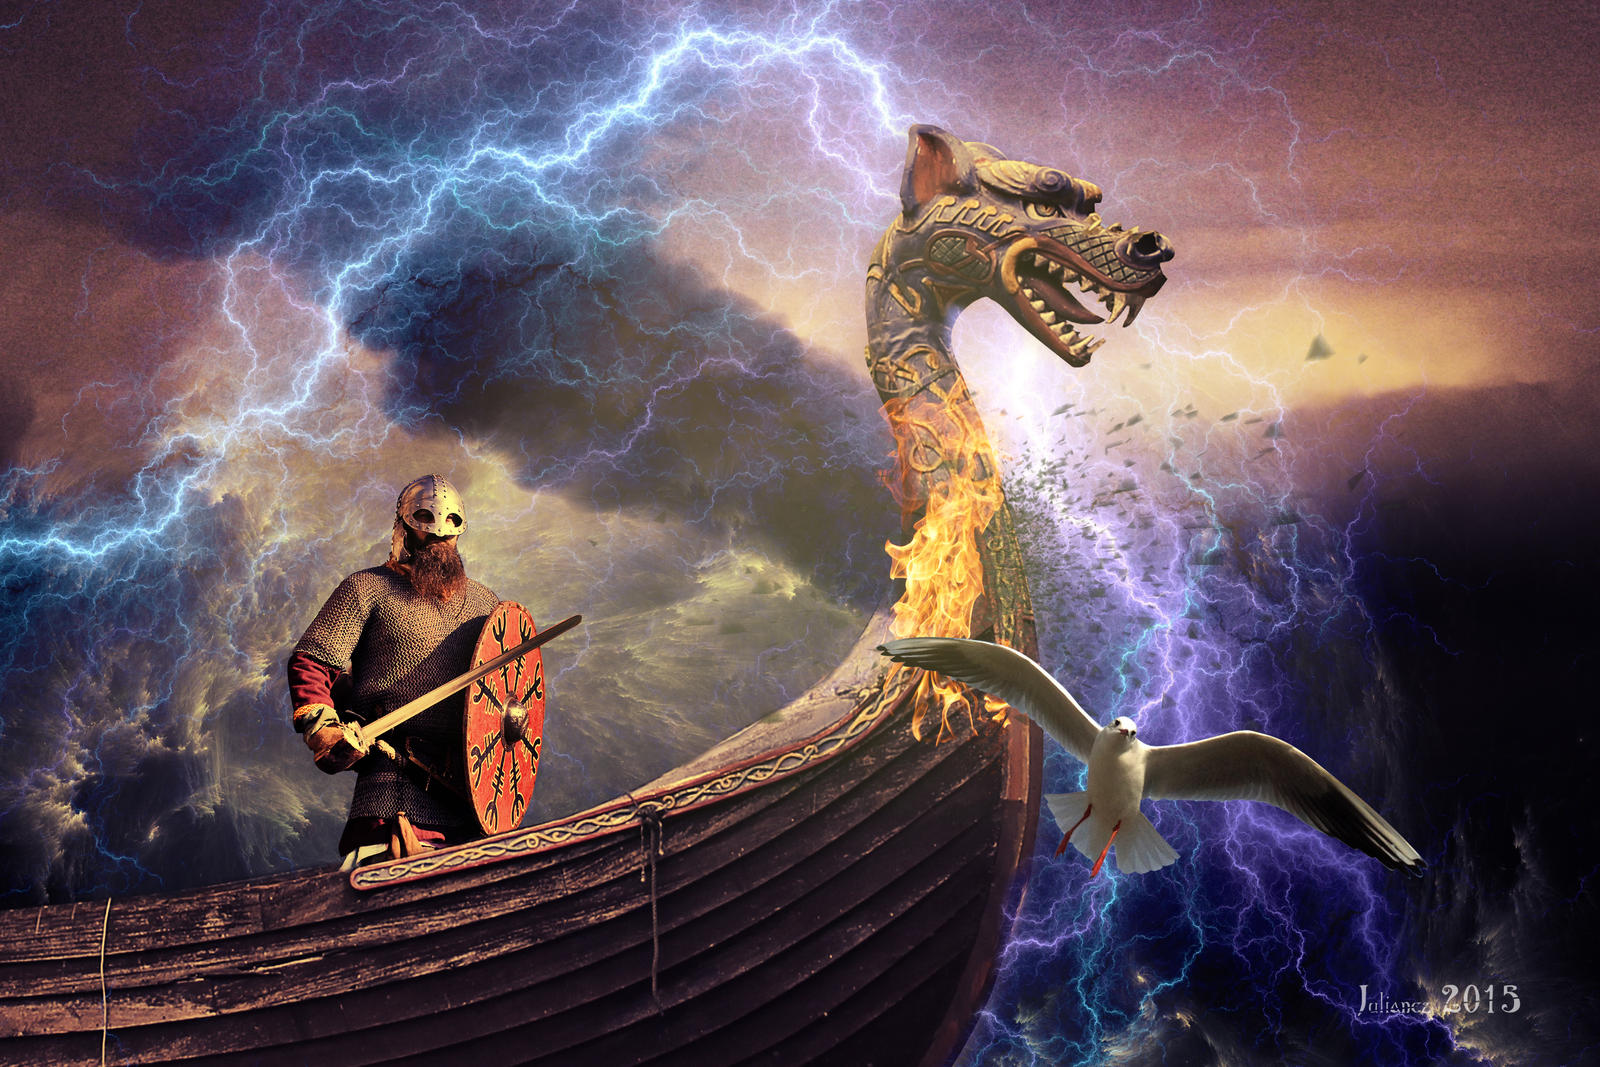 The wrath of Odin by Julianez